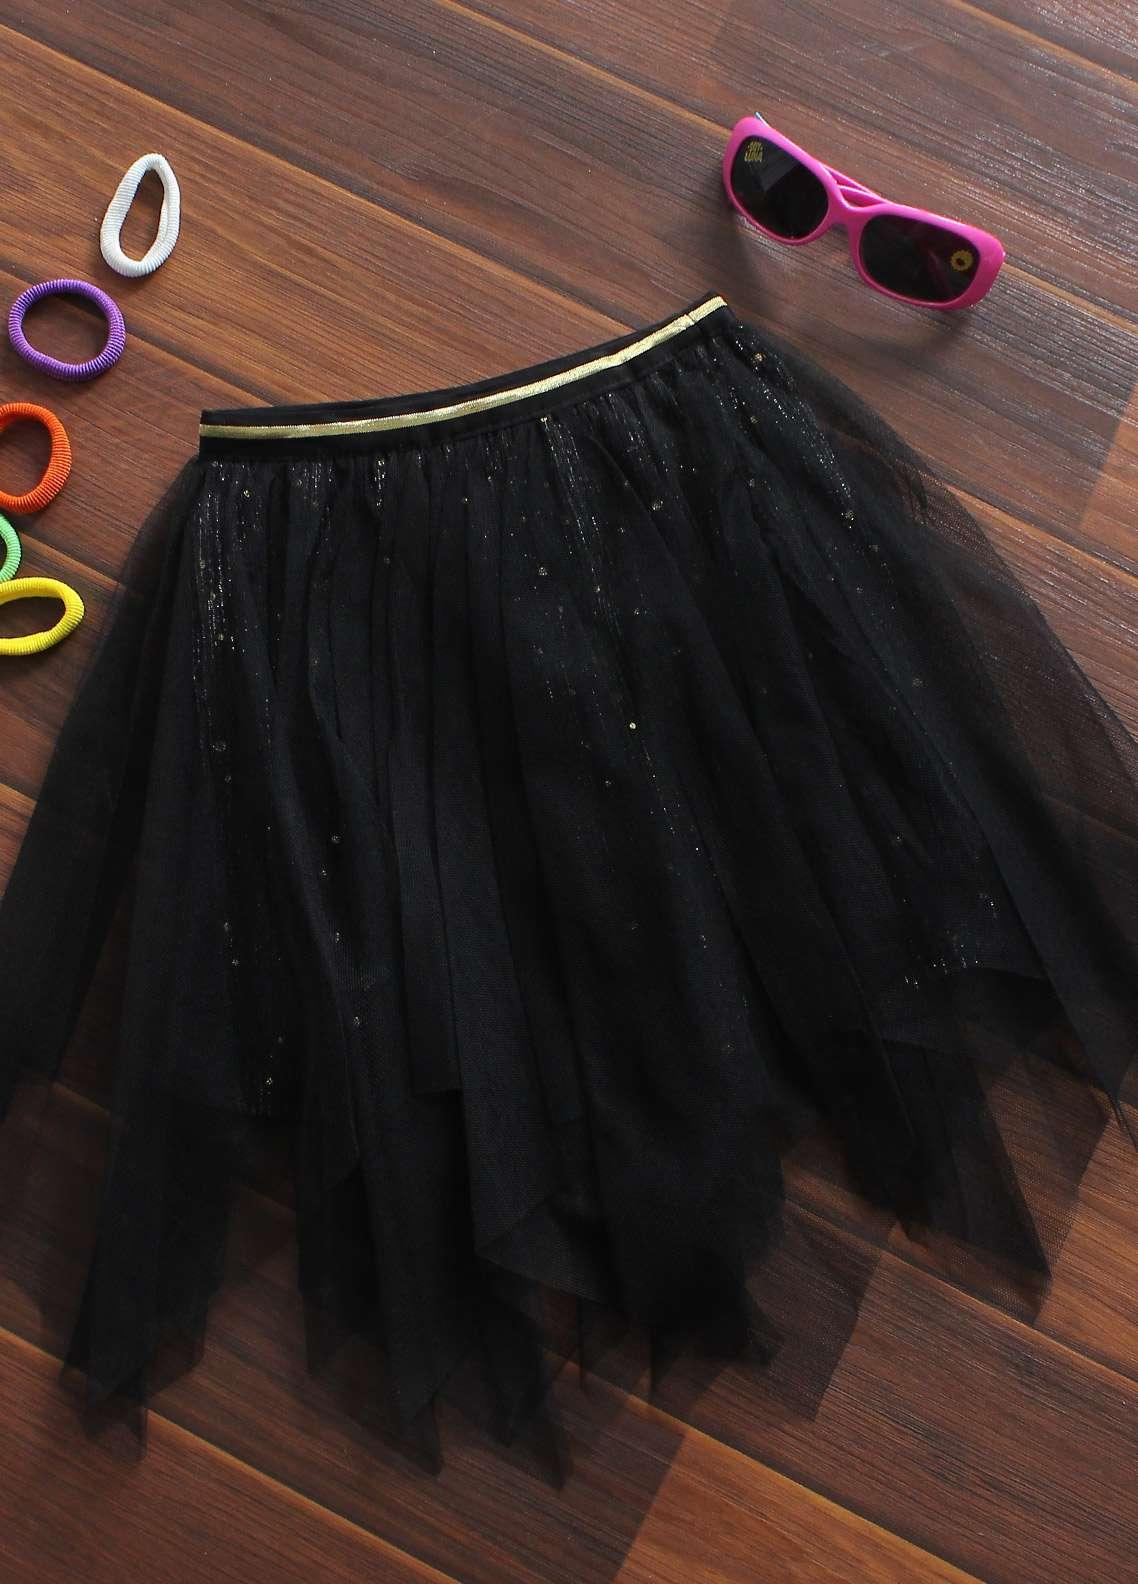 Sanaulla Exclusive Range Cotton Net Fancy Skirts for Girls -  08 Black